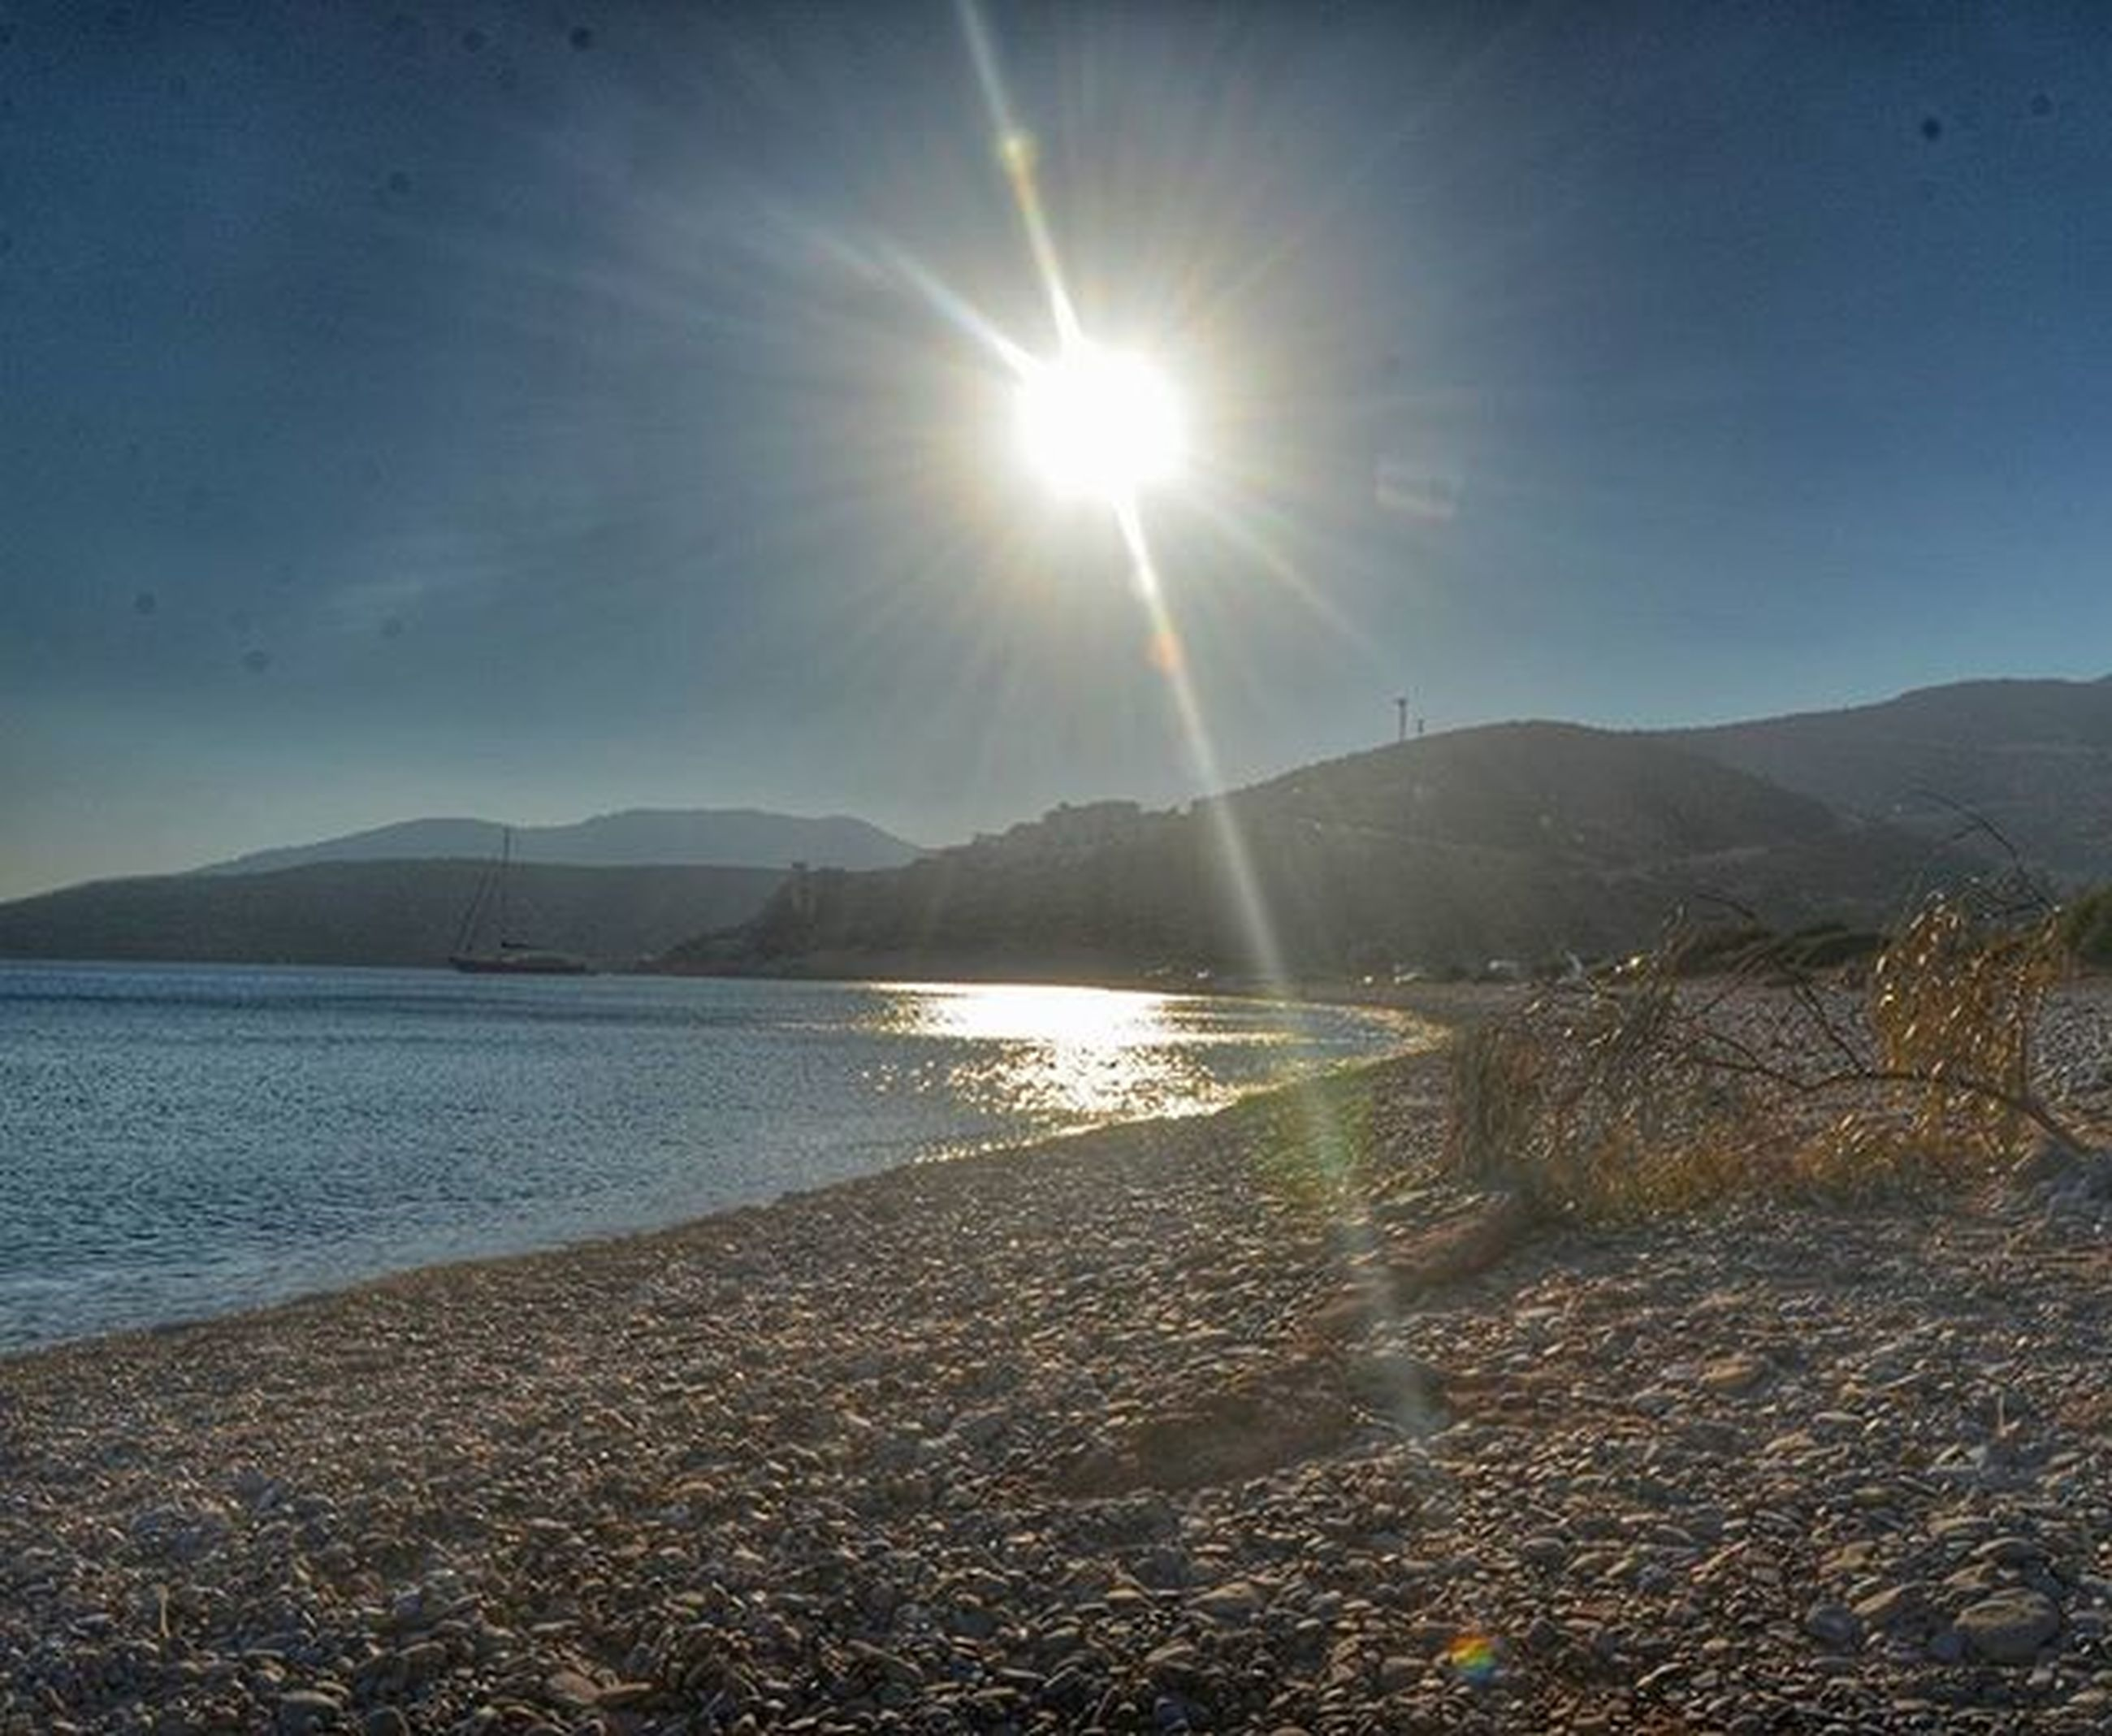 water, mountain, tranquil scene, tranquility, sun, scenics, beauty in nature, sunlight, sunbeam, nature, sky, reflection, sea, lens flare, mountain range, beach, lake, clear sky, idyllic, shore